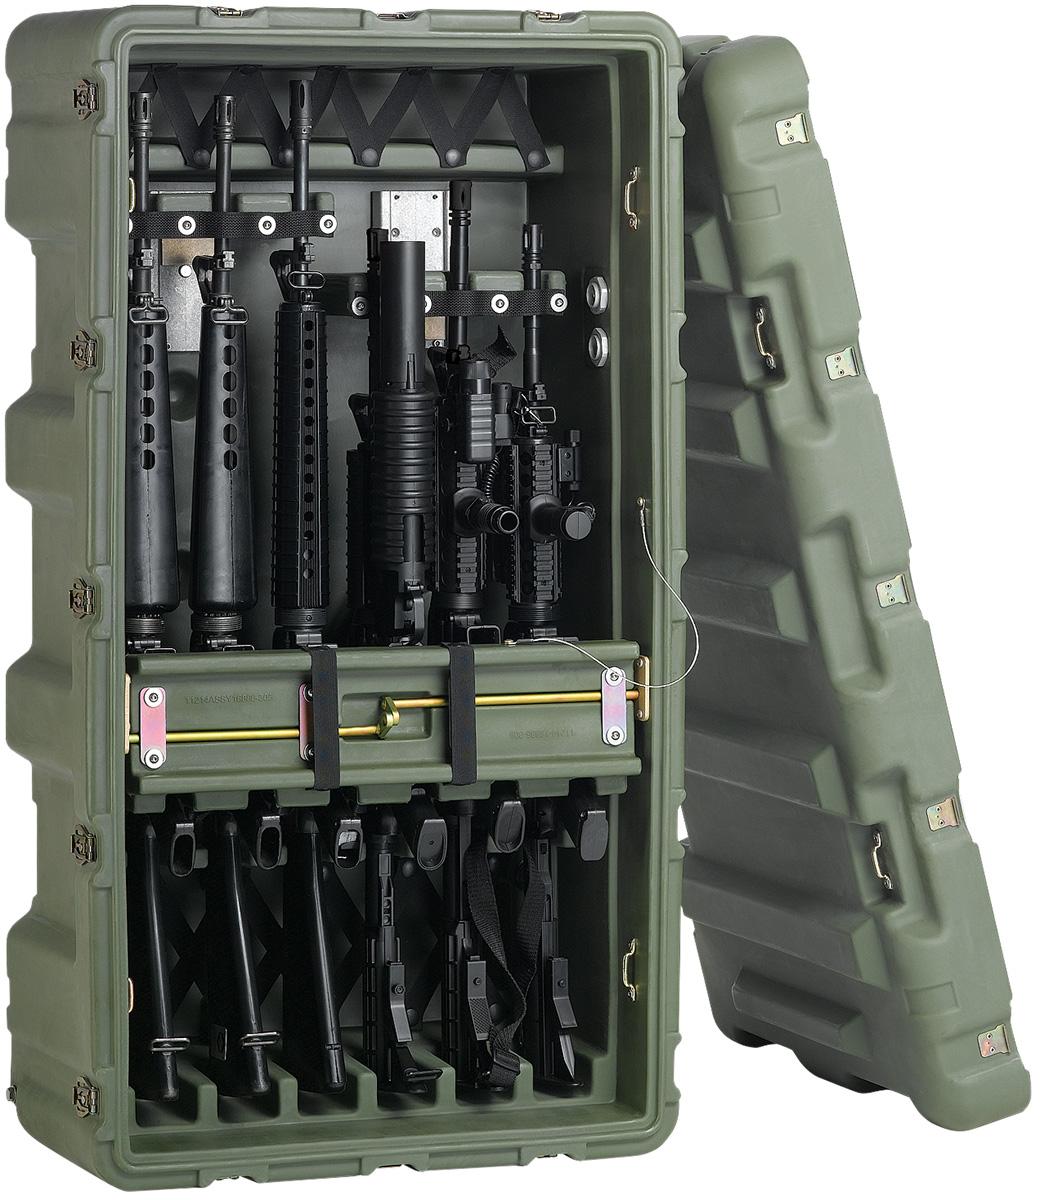 pelican peli products 472 M4 M16 6 usa military m4 m16 hardcase